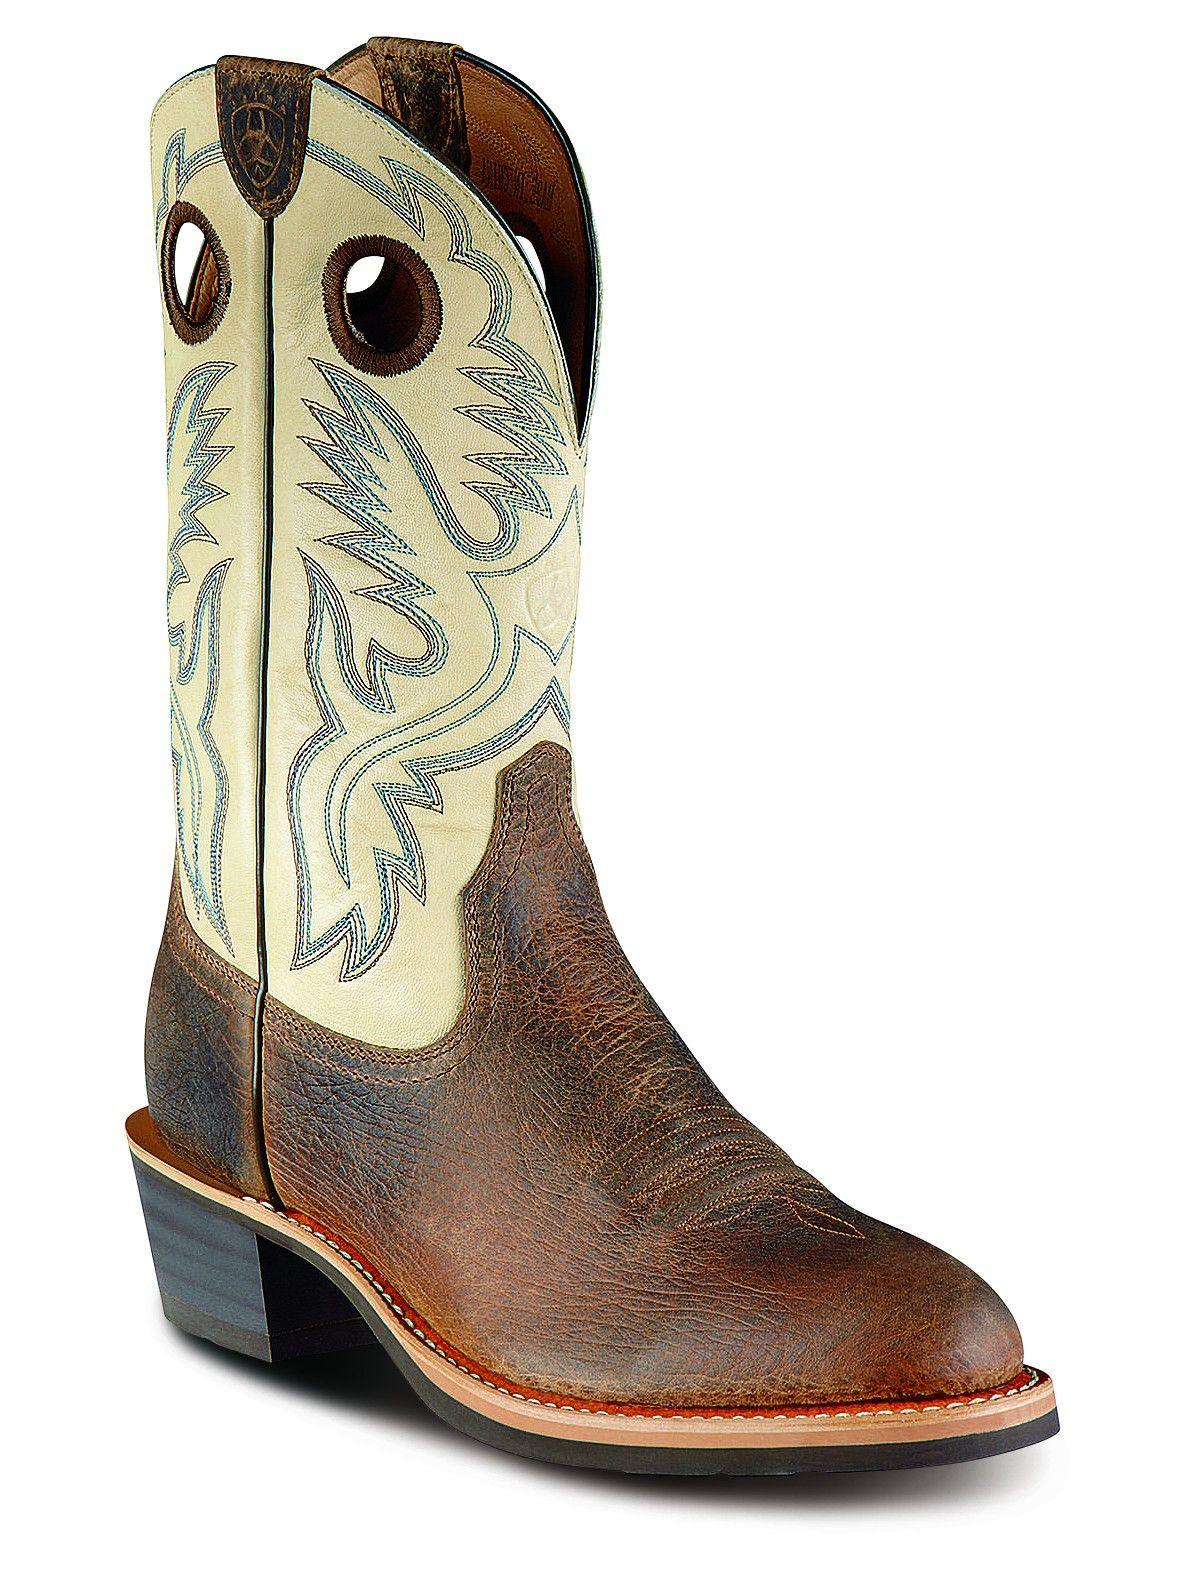 6df7fbfbf3e Mens Ariat Cream Roughstock Boots 10007992 - Texas Boot Company is ...